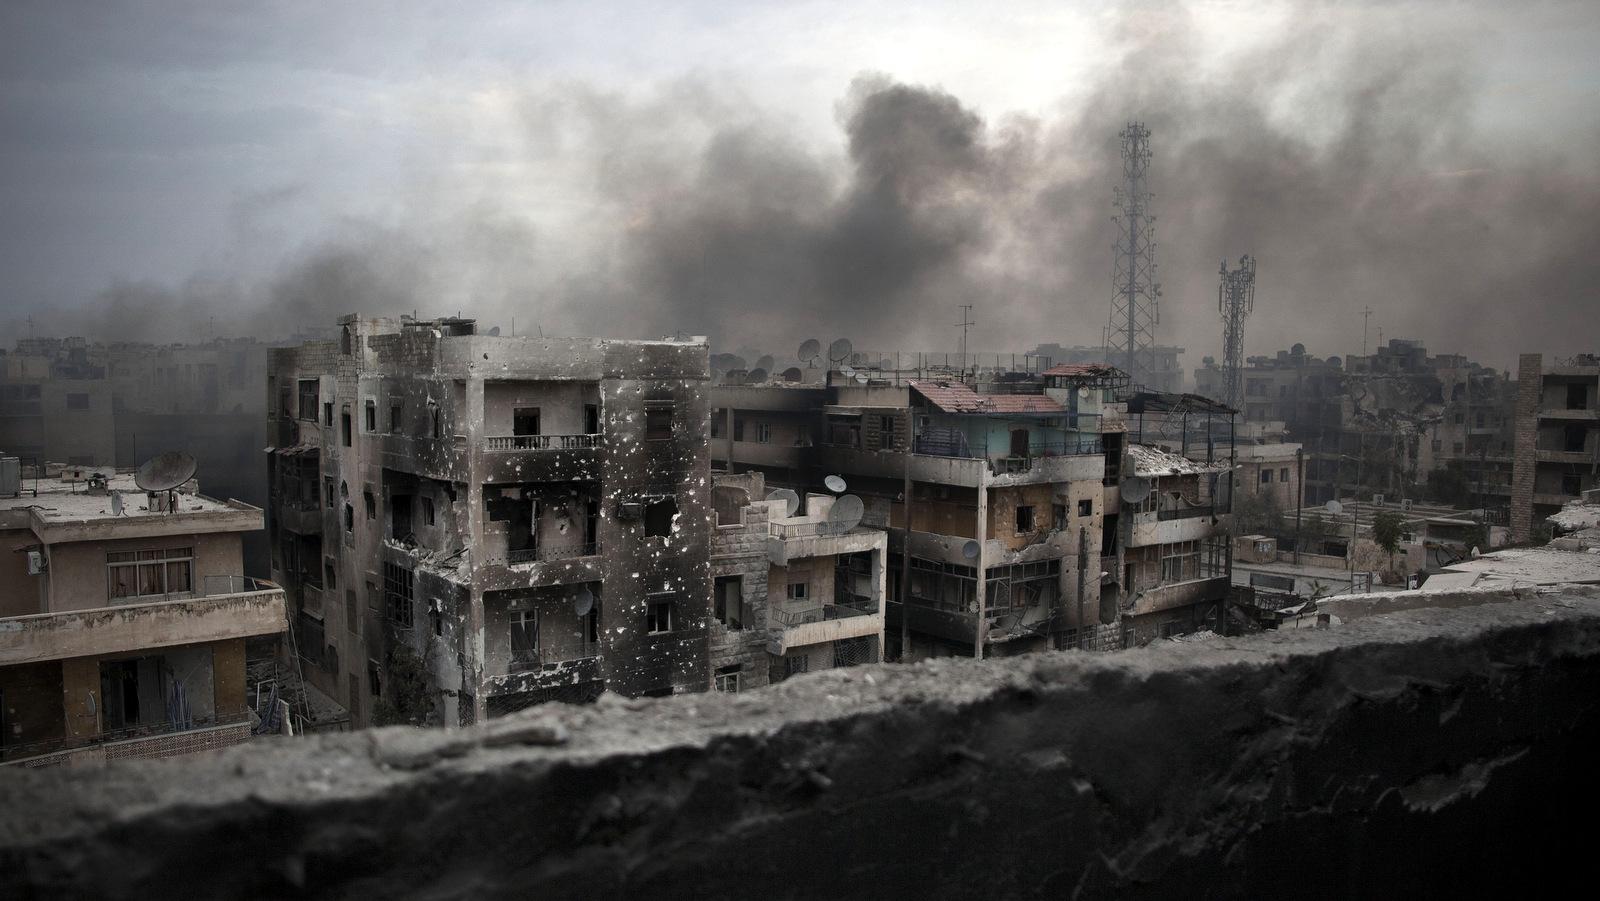 Smoke rises over Saif Al Dawla district in Aleppo, Syria, Tuesday, Oct. 2, 2012 .(AP Photo/ Manu Brabo)